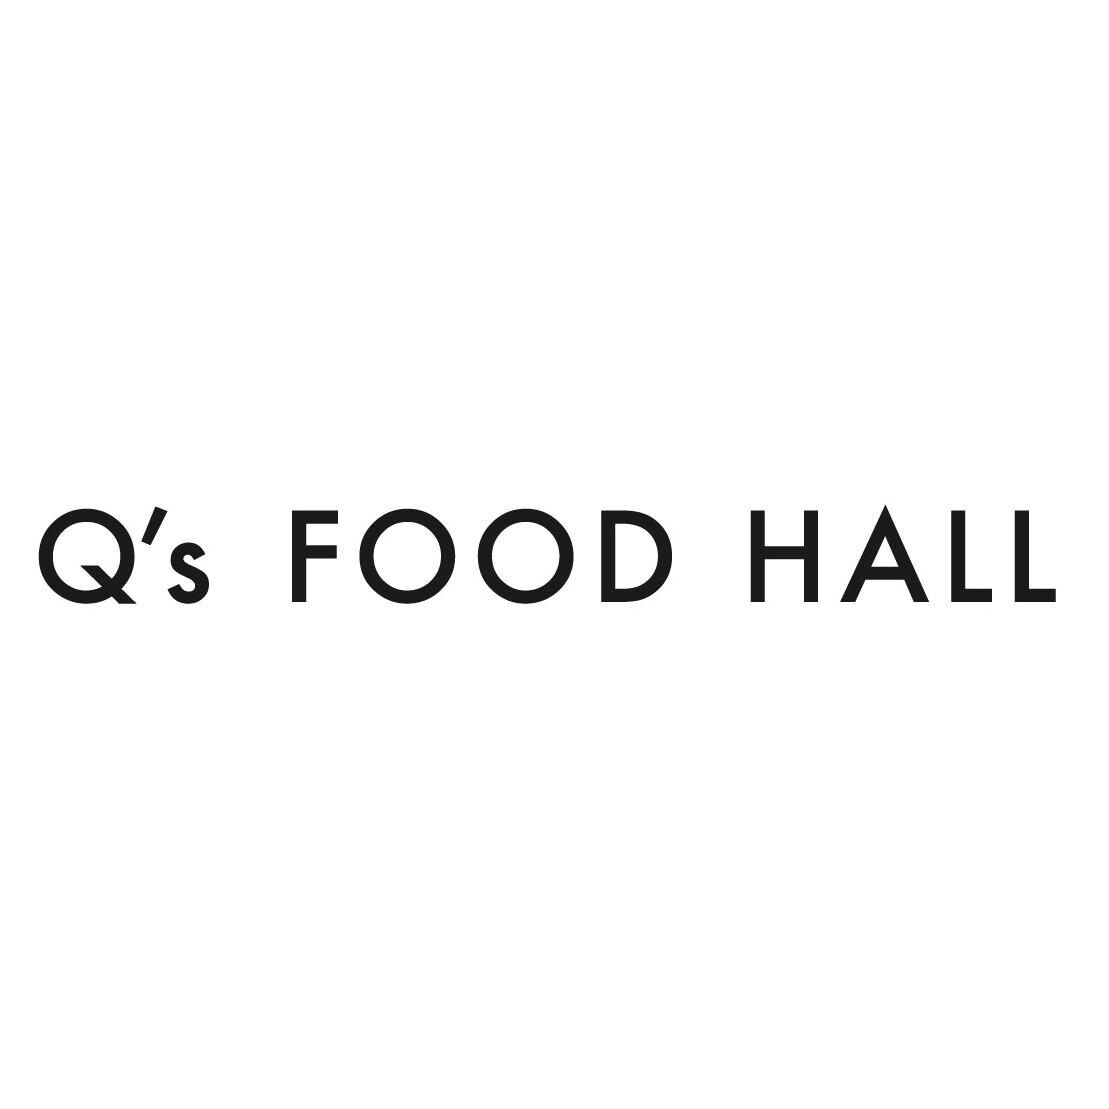 Q's FOOD HALL